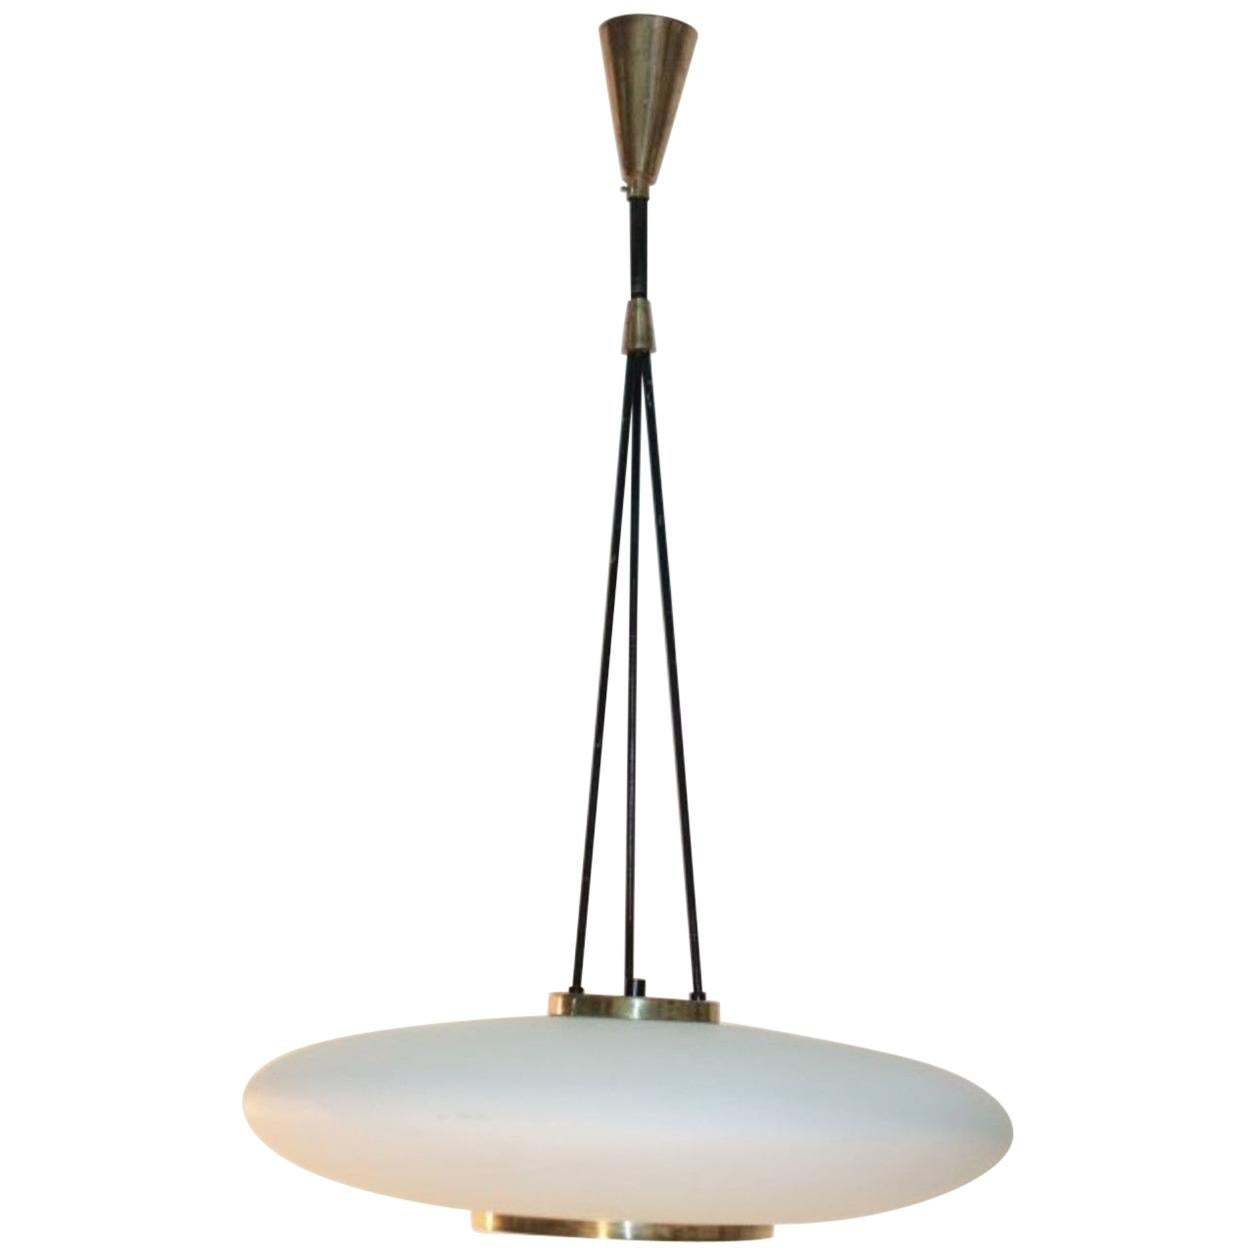 Midcentury Pendant Lamp by Stilnovo